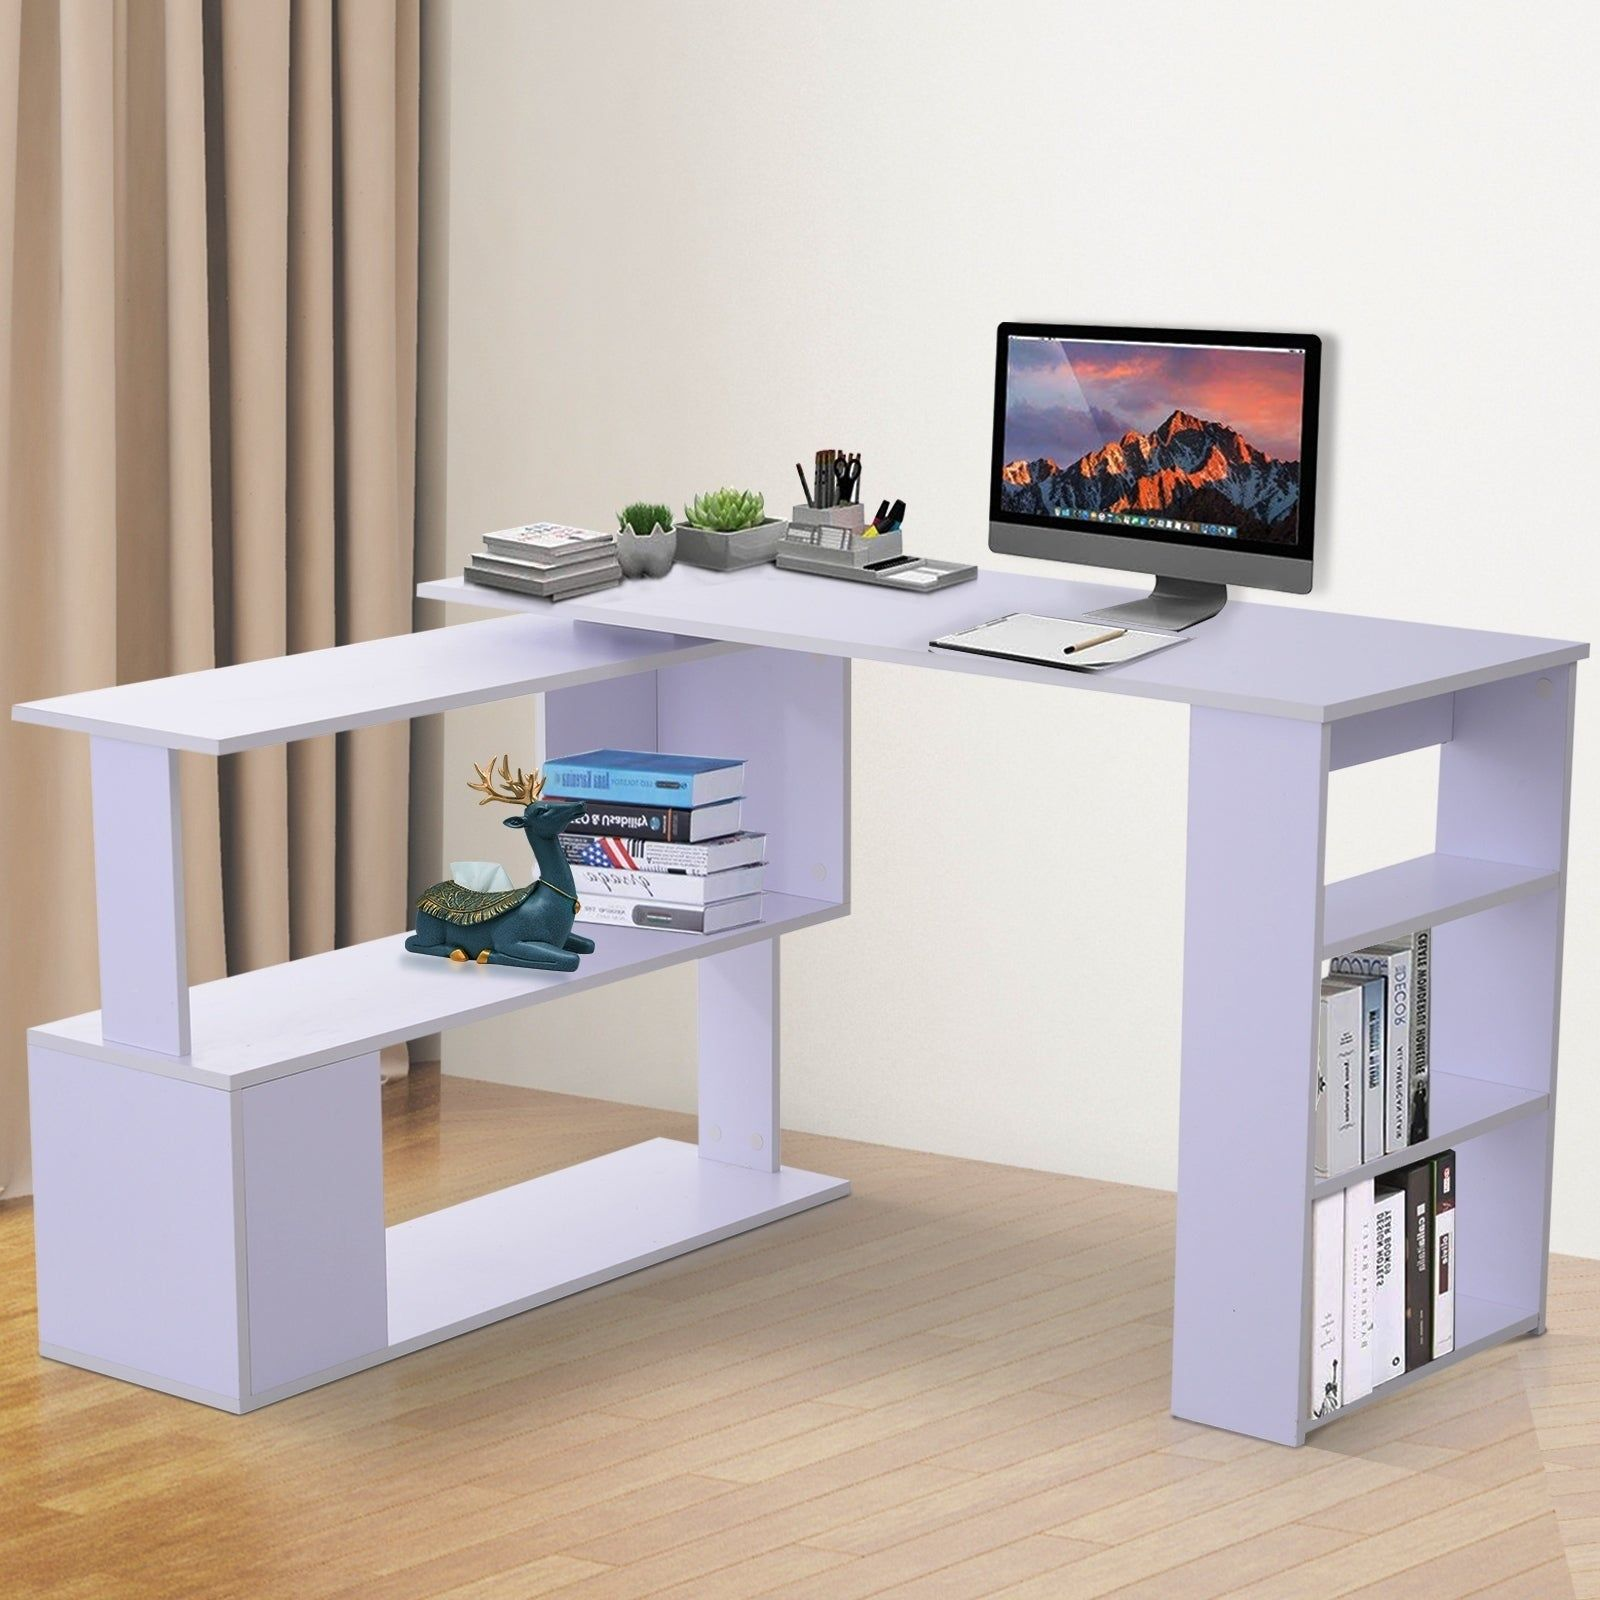 Homcom Modern L Shaped Rotating Computer Desk With Bookshelves